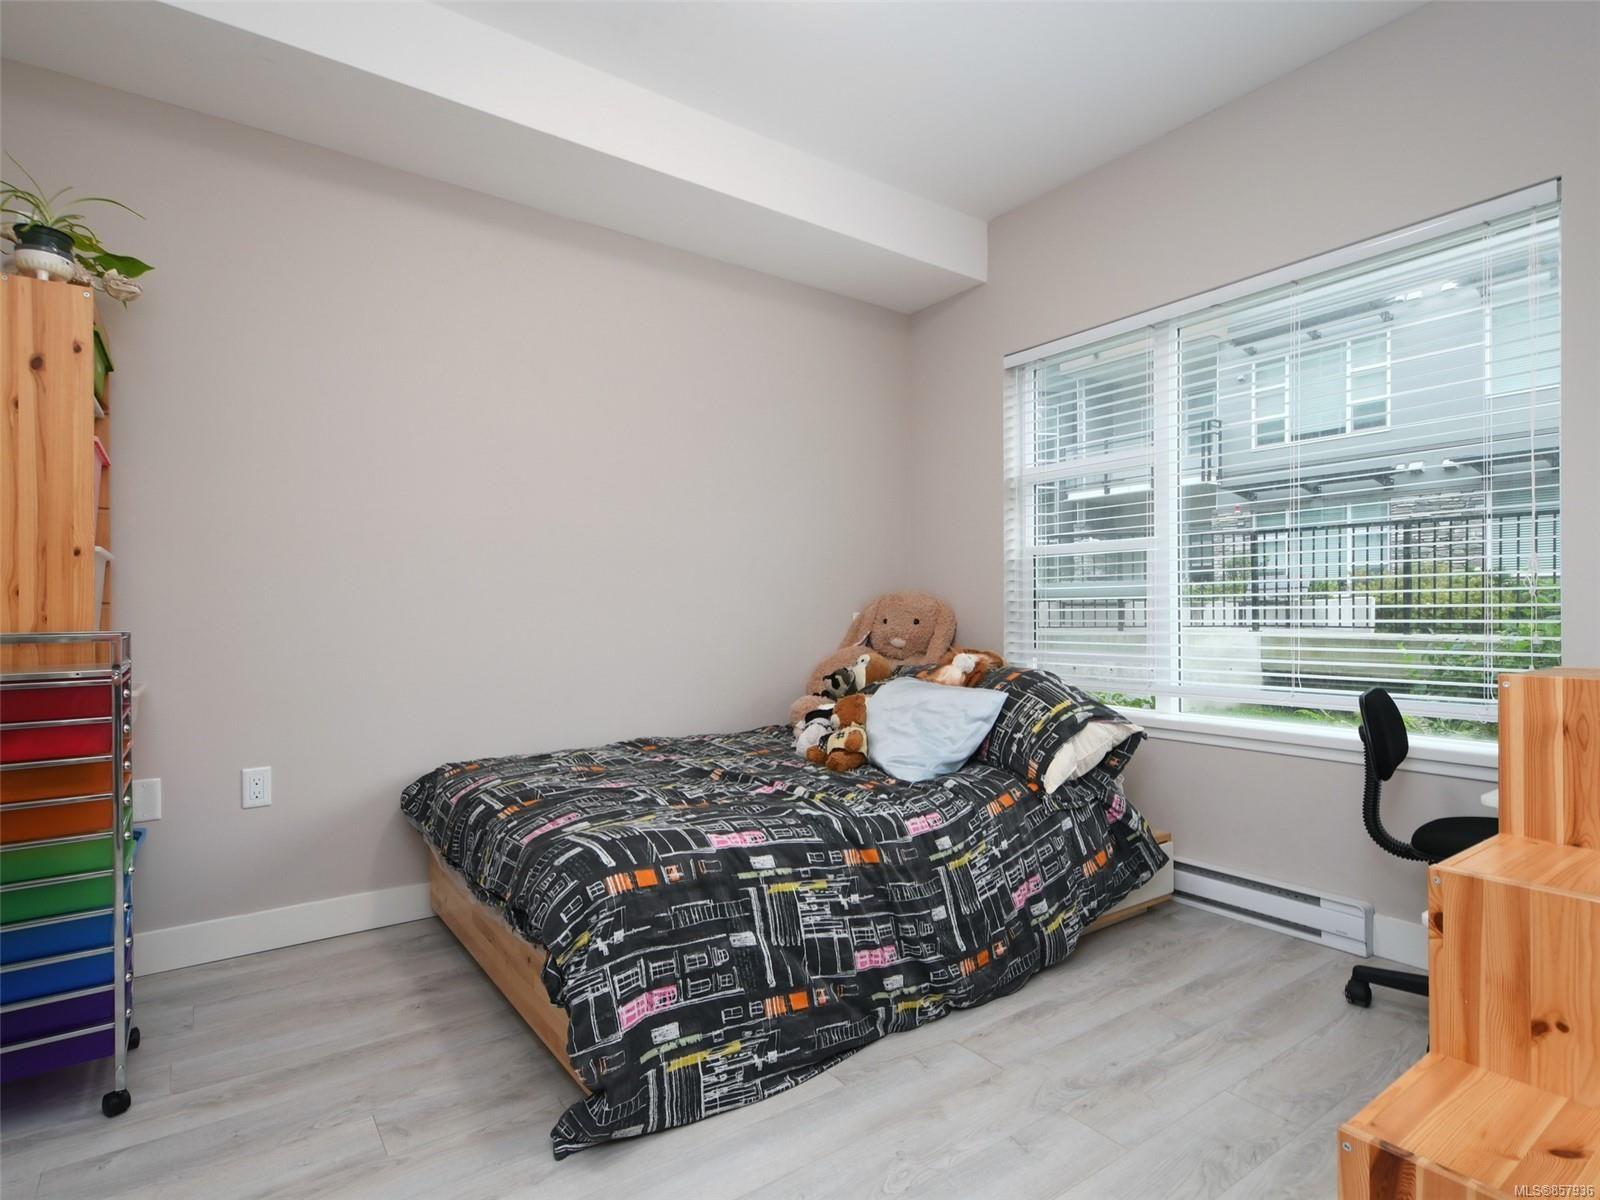 Photo 16: Photos: 103 1020 Inverness Rd in Saanich: SE Quadra Condo for sale (Saanich East)  : MLS®# 857936